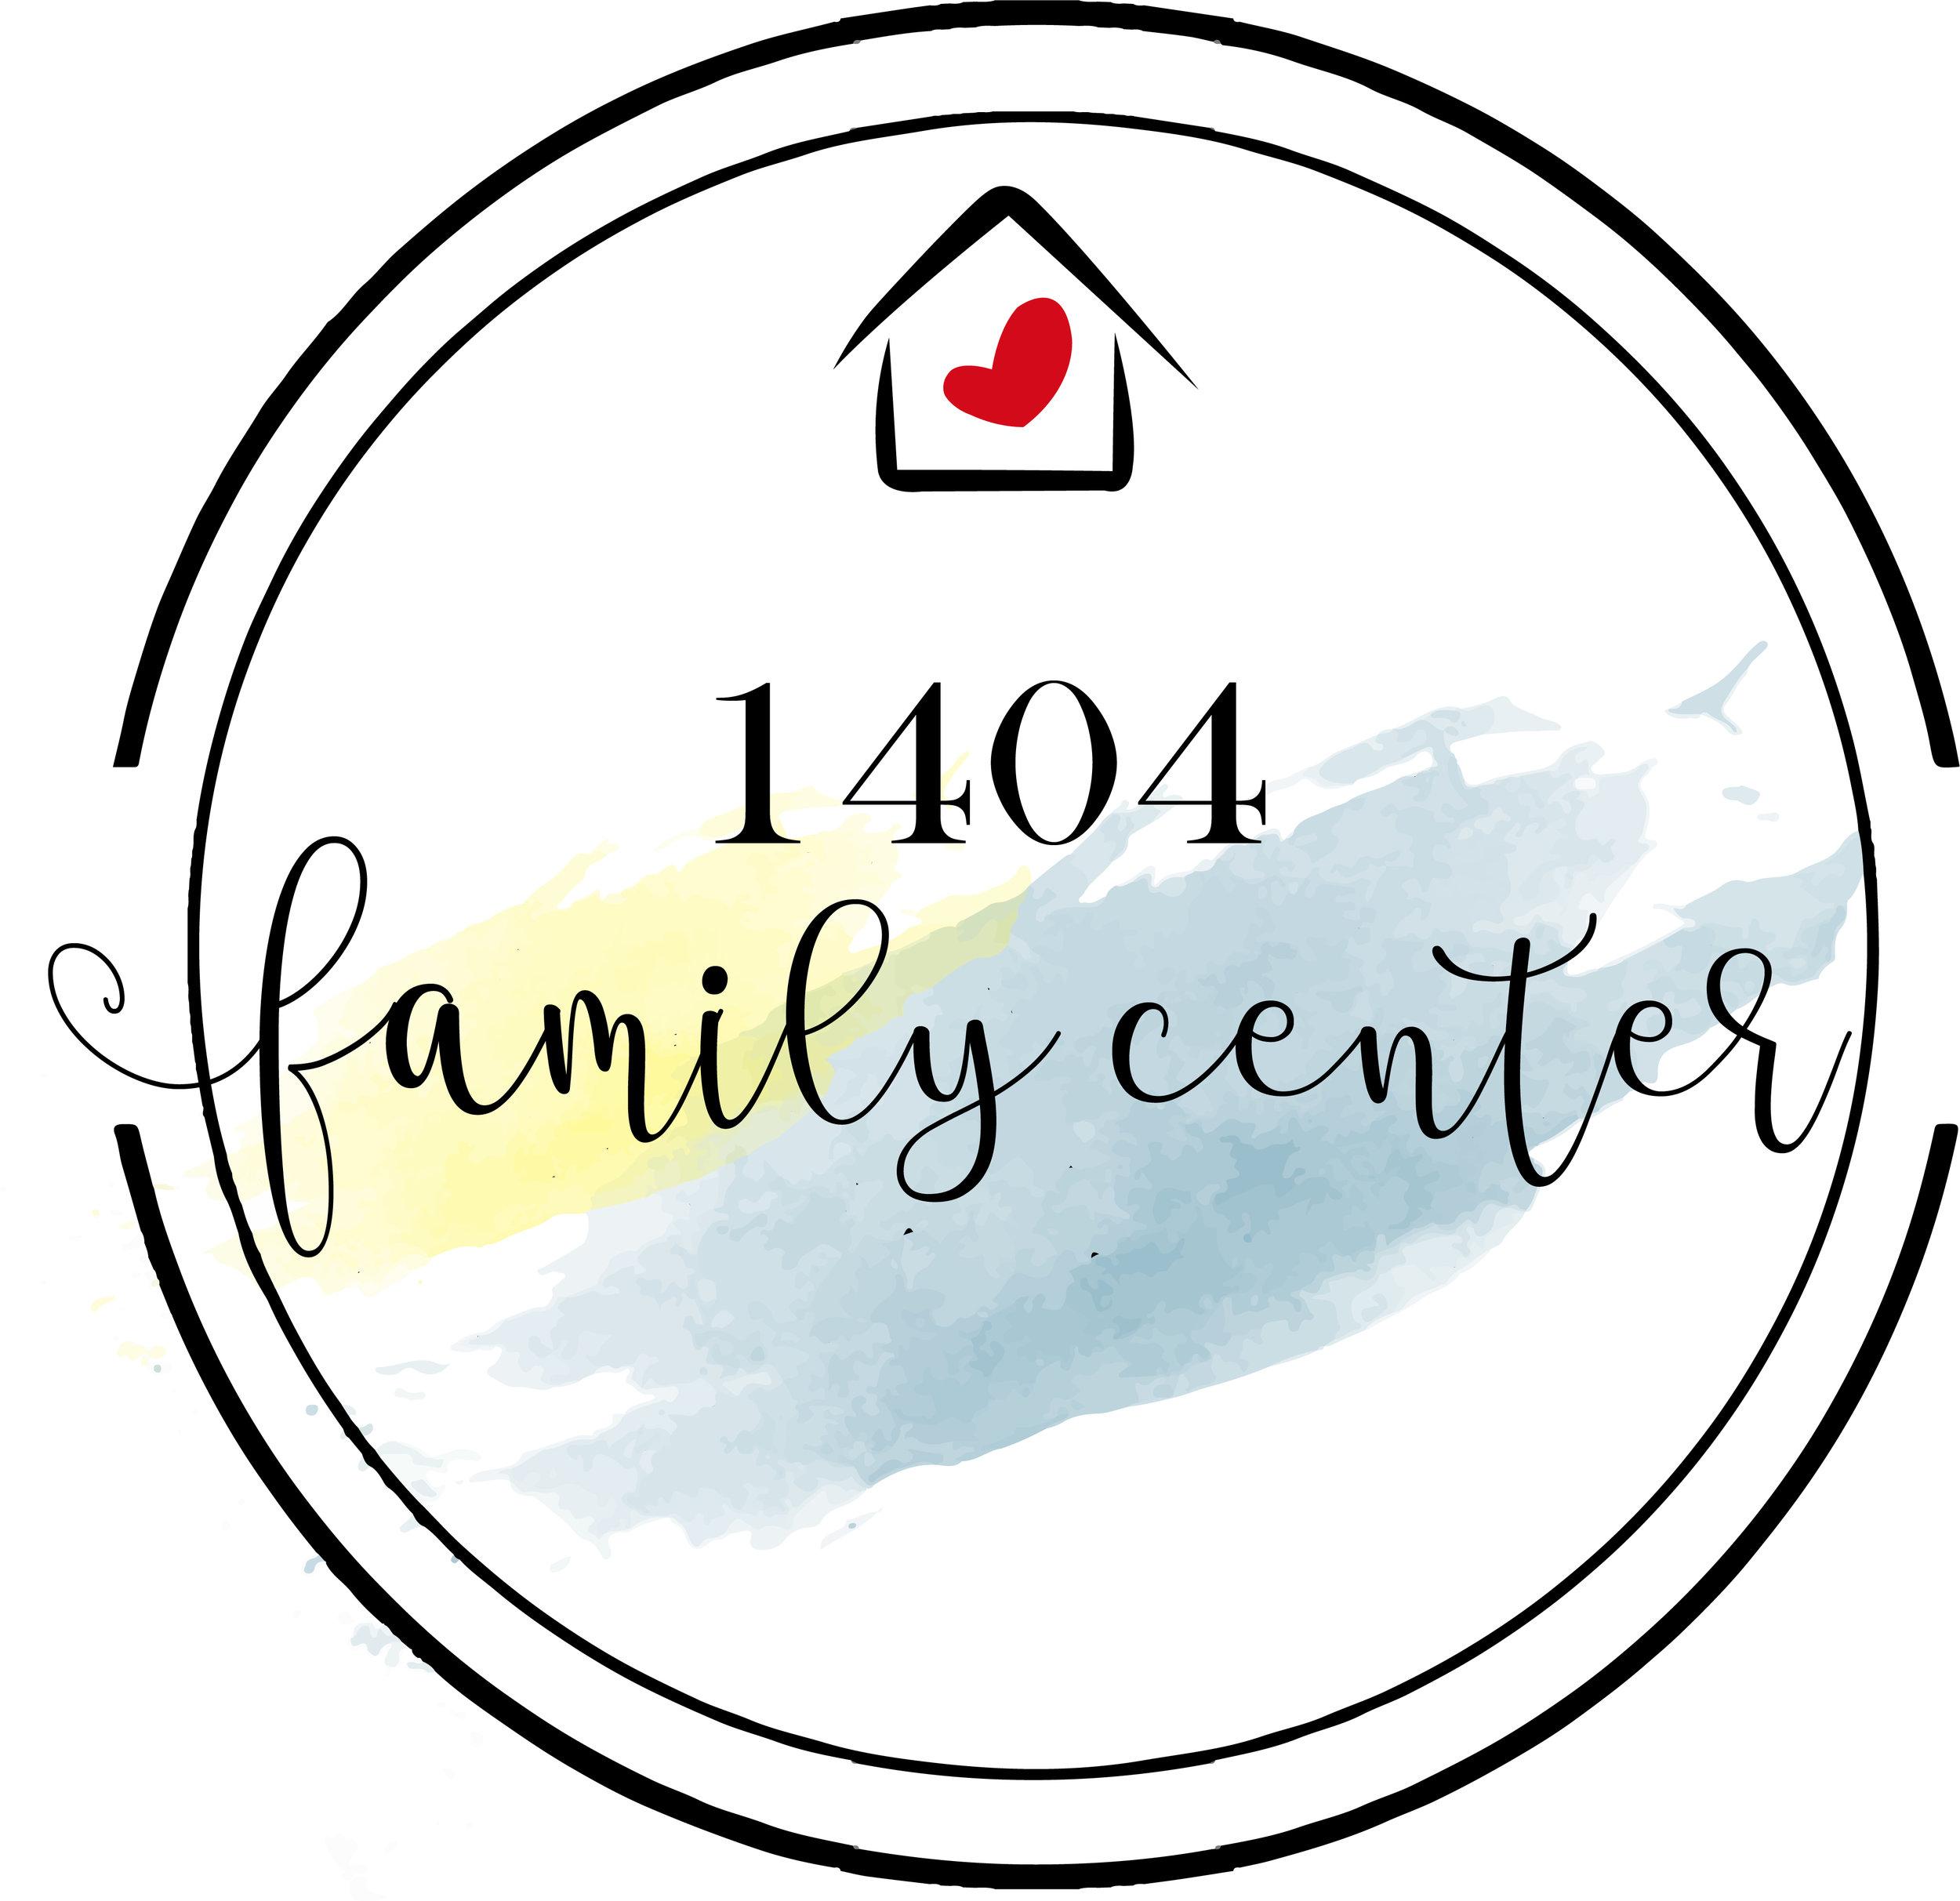 Non-profit Community Counseling Center -